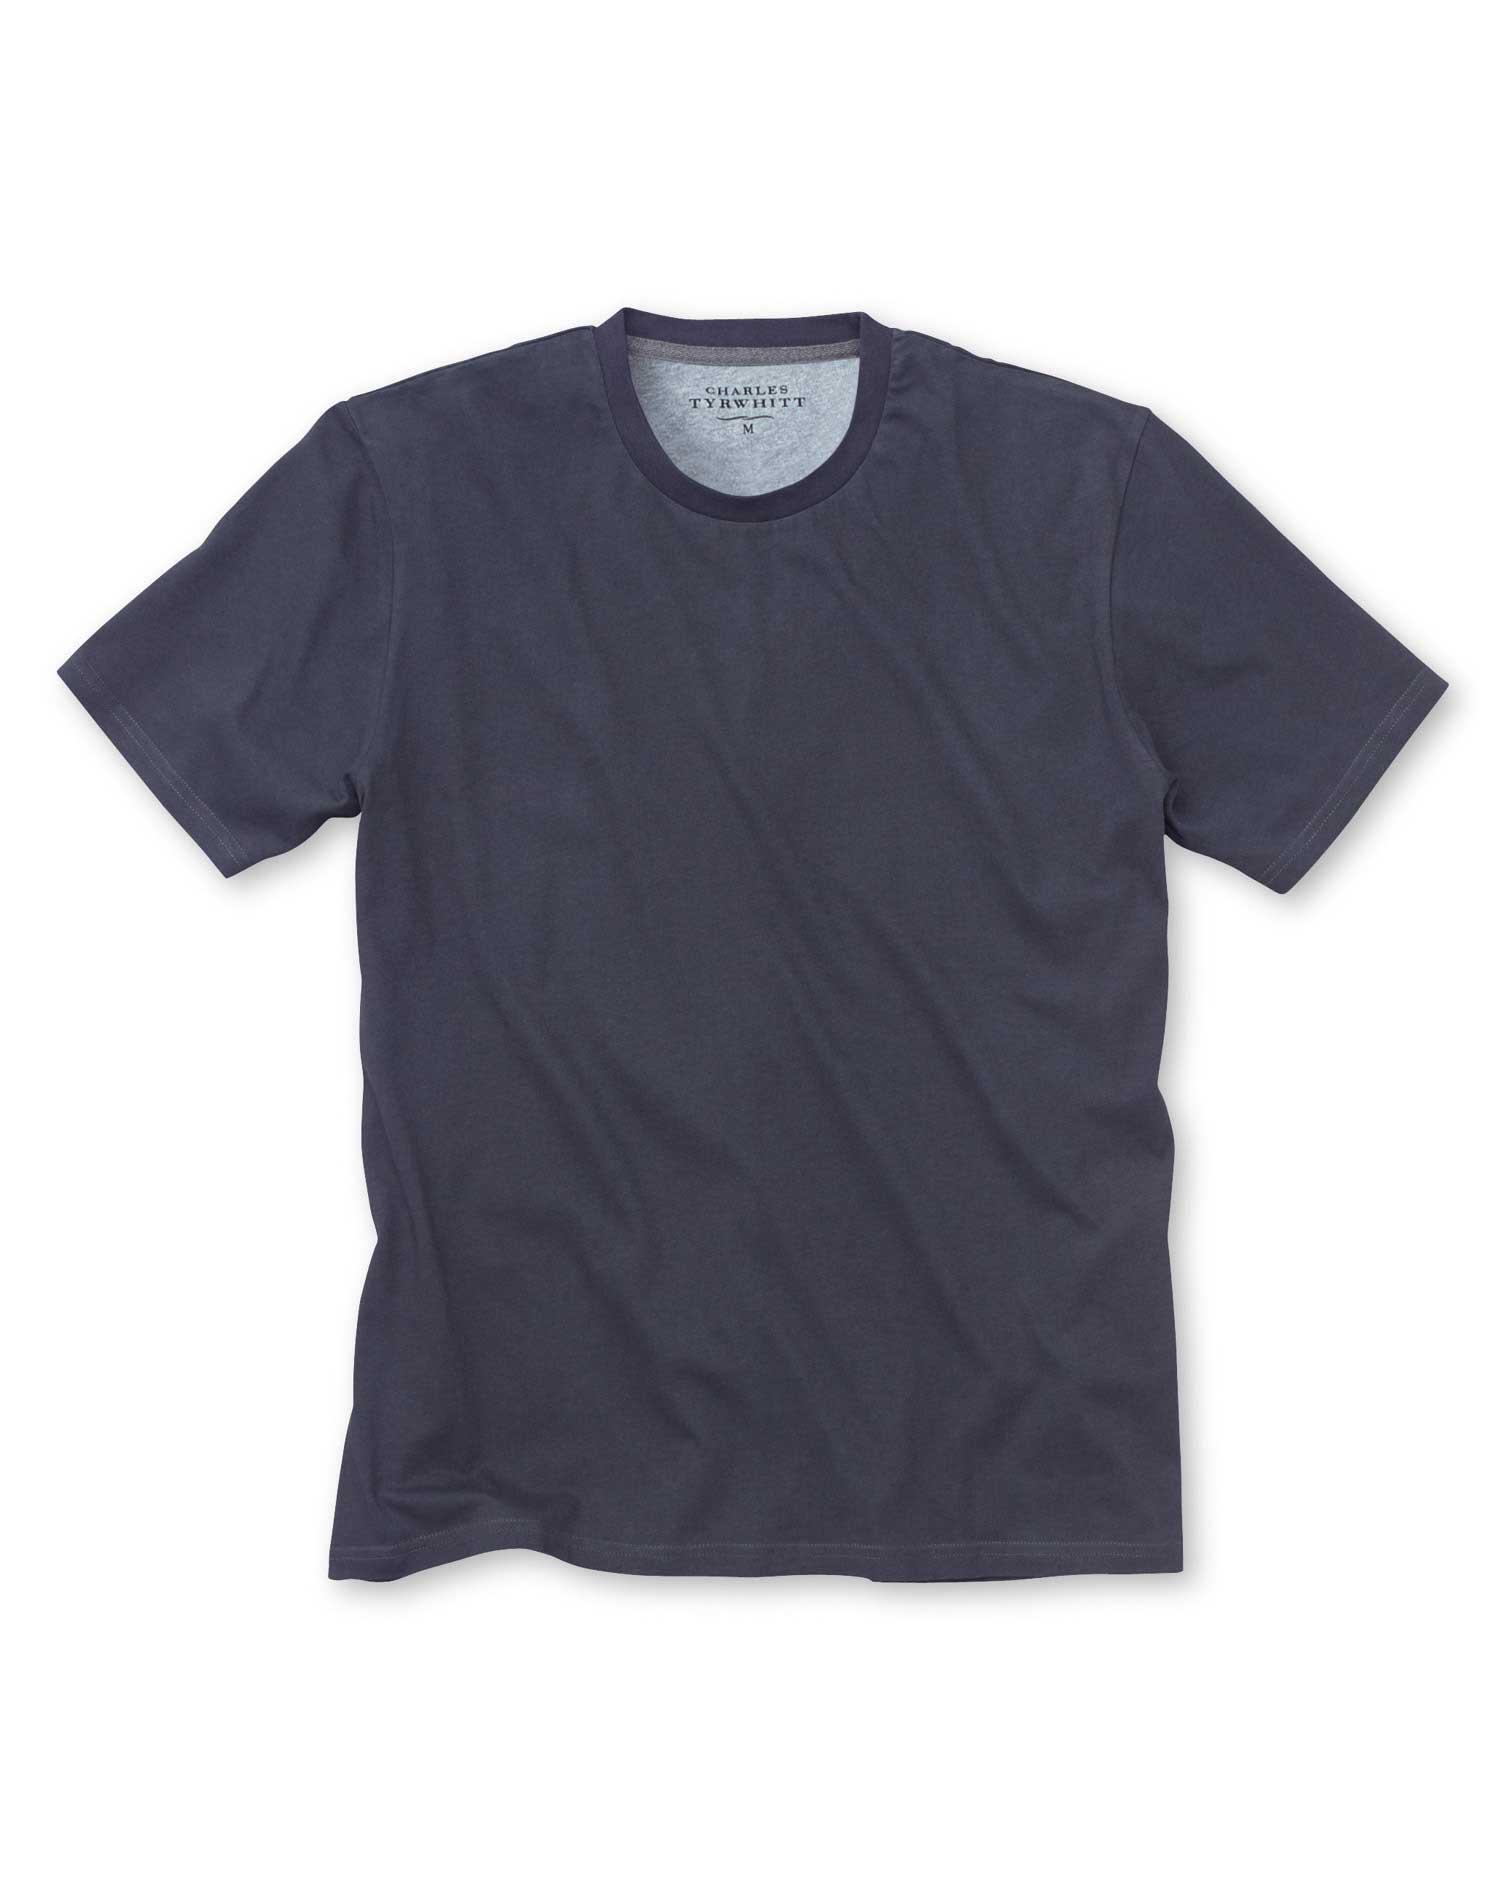 Navy Cotton T-Shirt Size XS by Charles Tyrwhitt